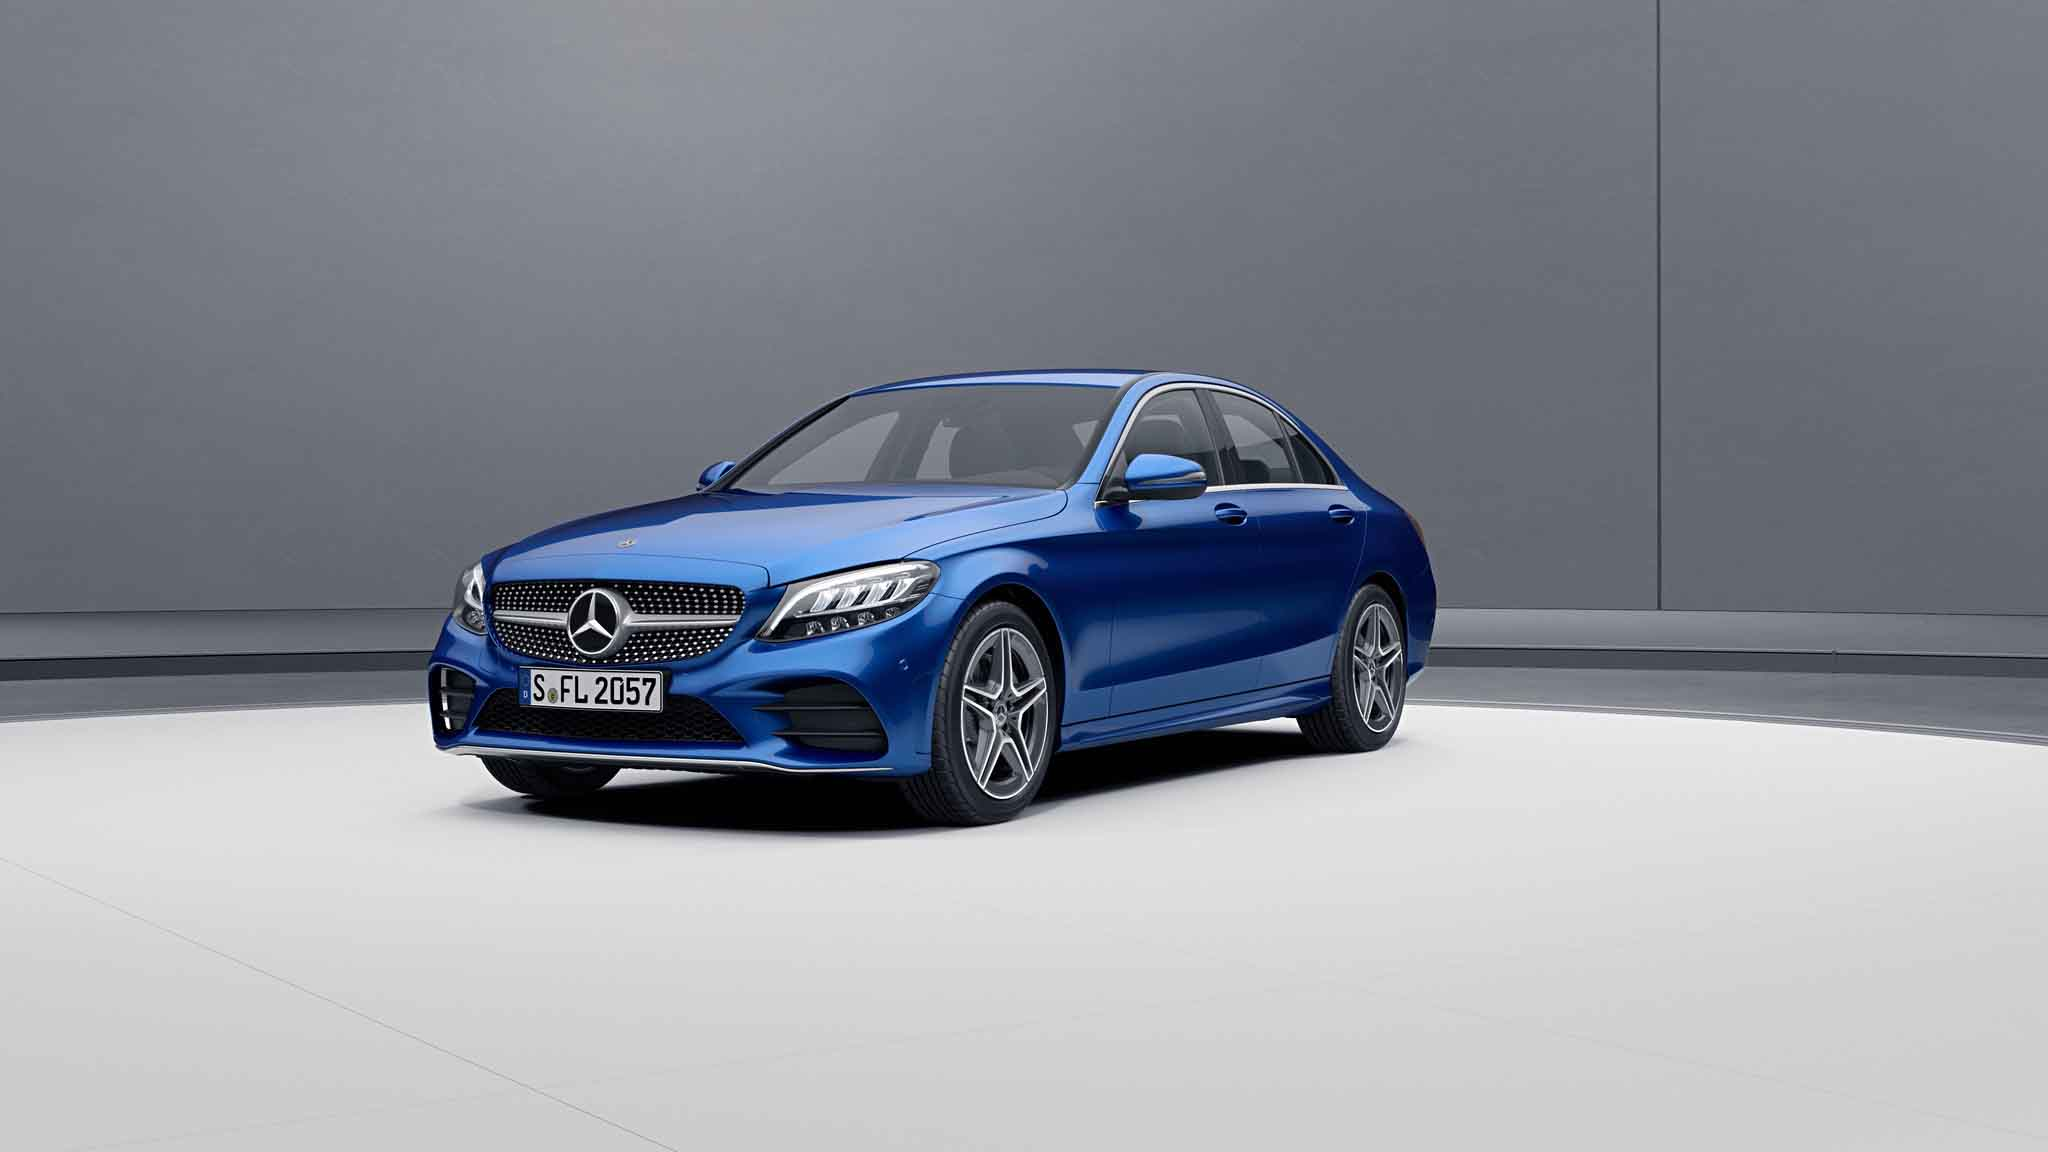 Vue de trois quarts de profil de la Mercedes-Benz Classe C Berline avec la peinture Métallisé - Bleu brillant